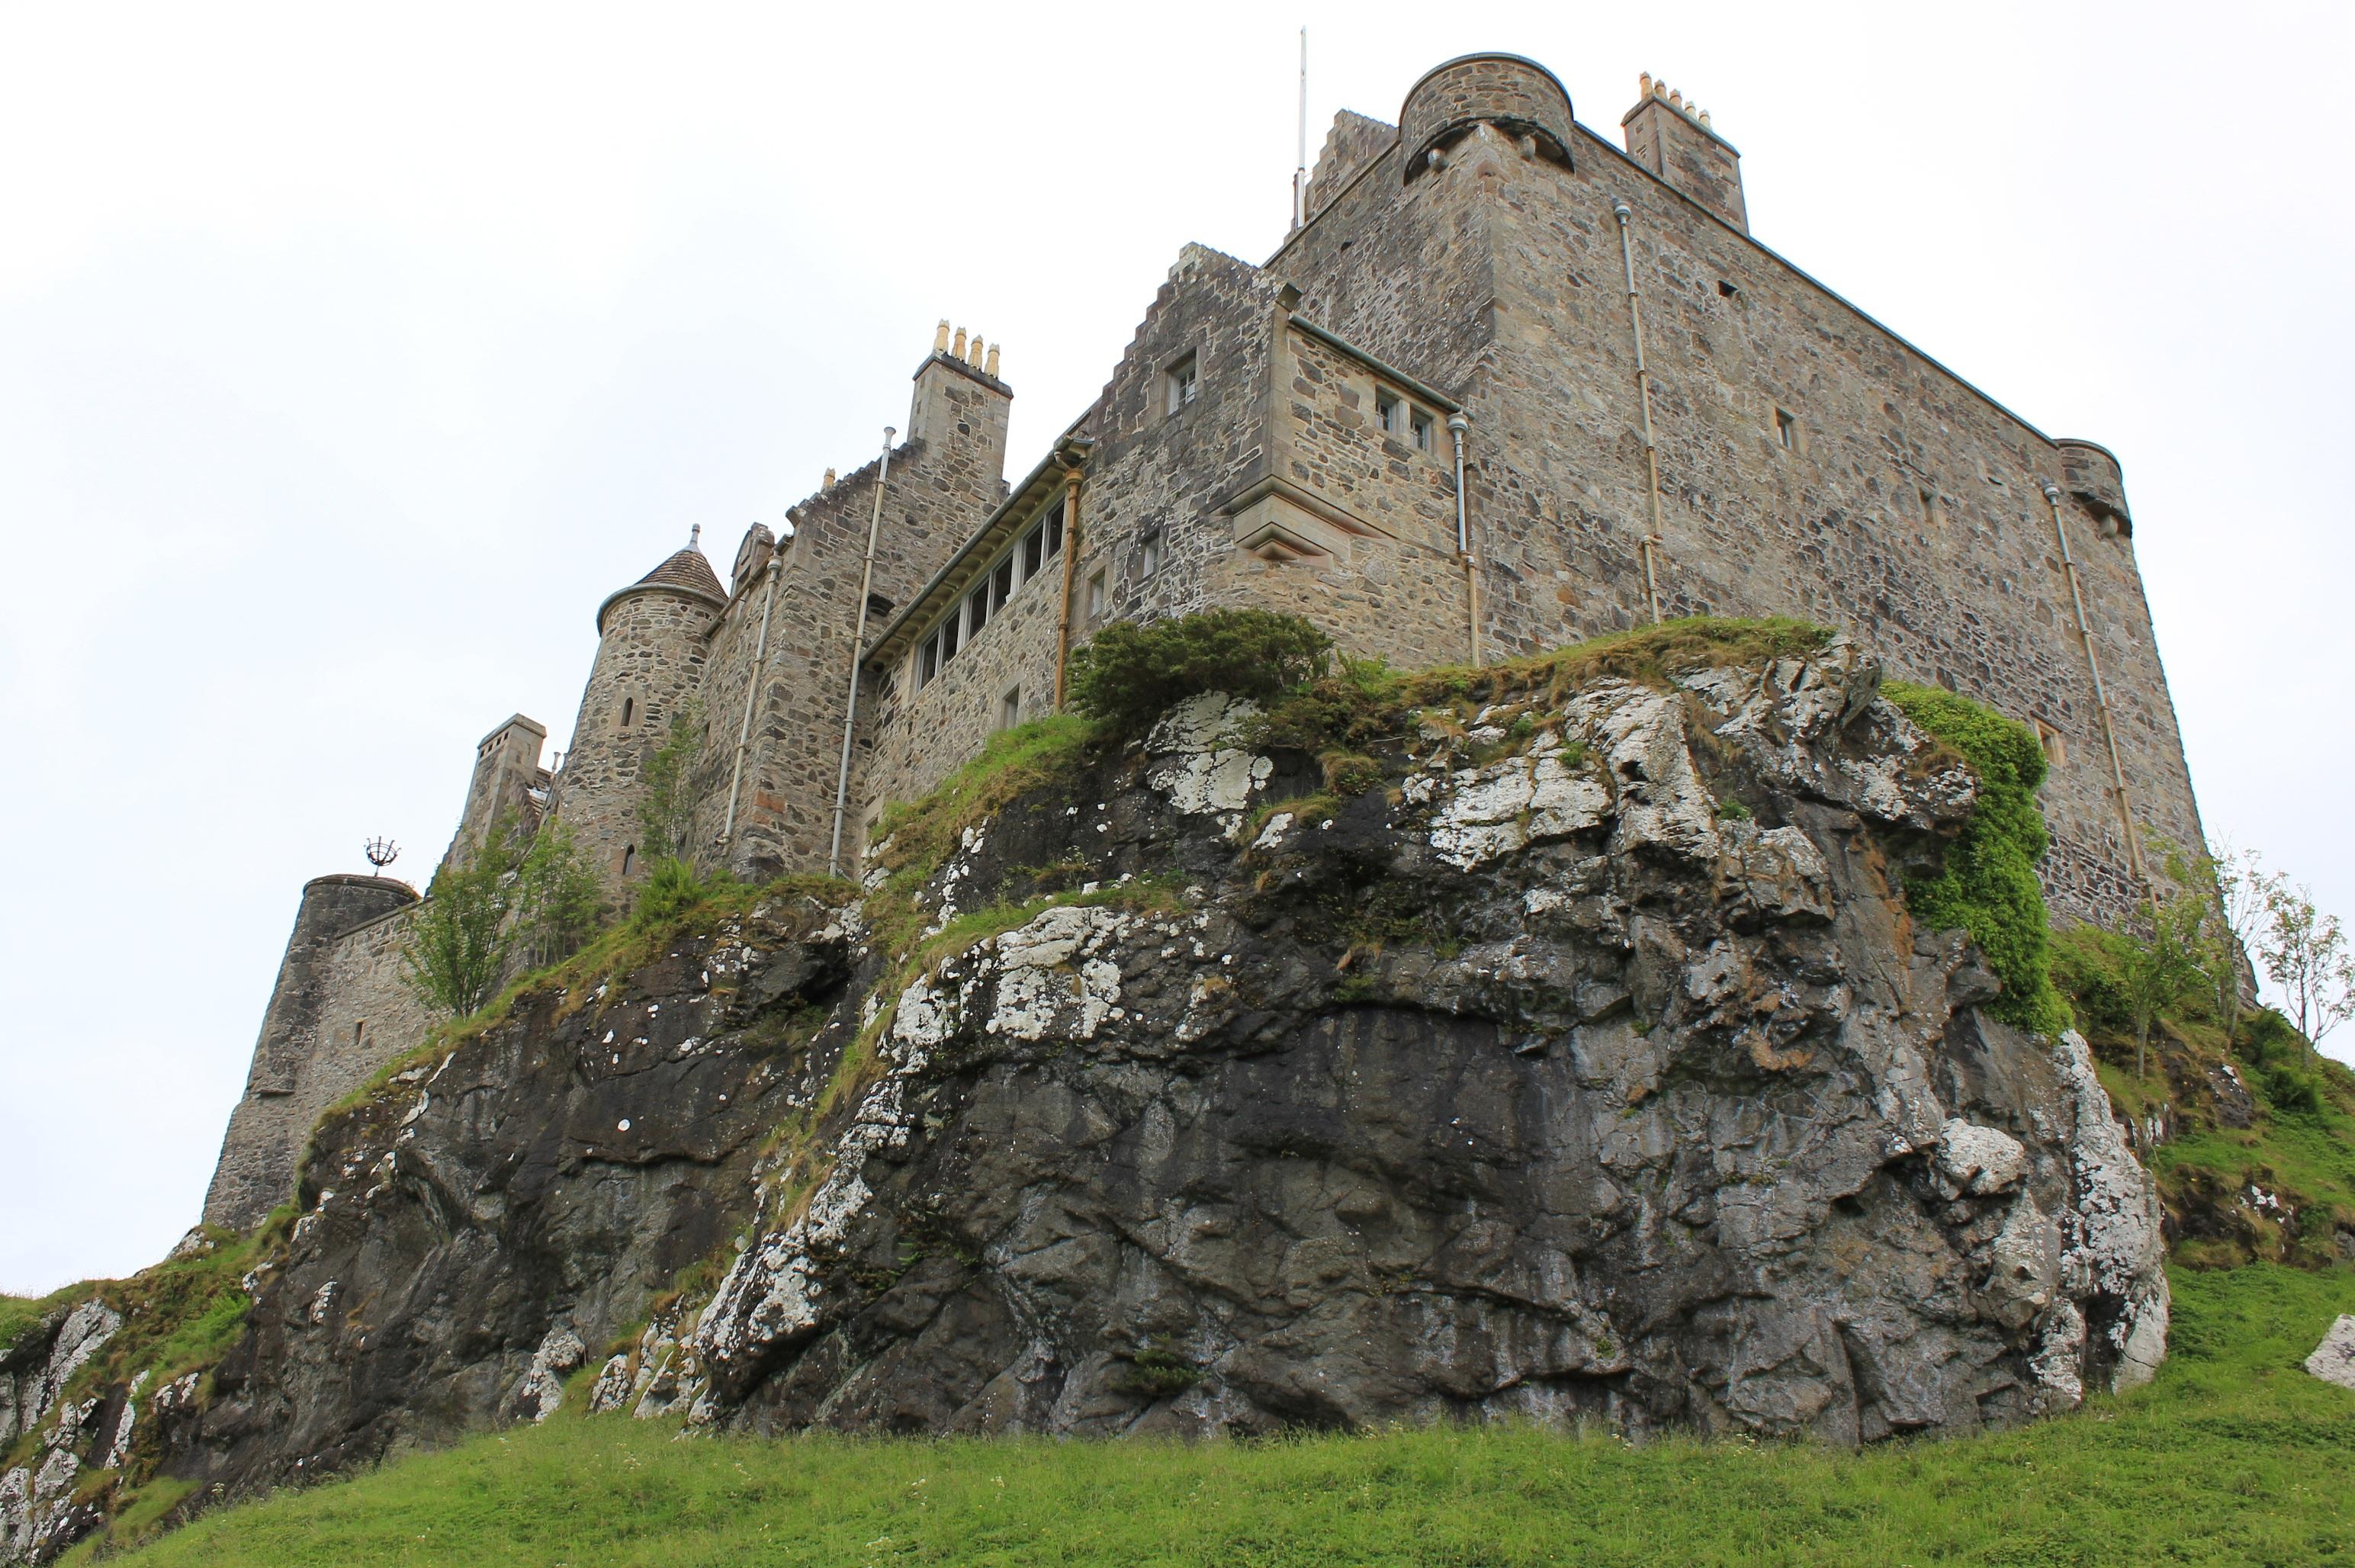 Duart-Castle-onlymyalias-on-Pixabay